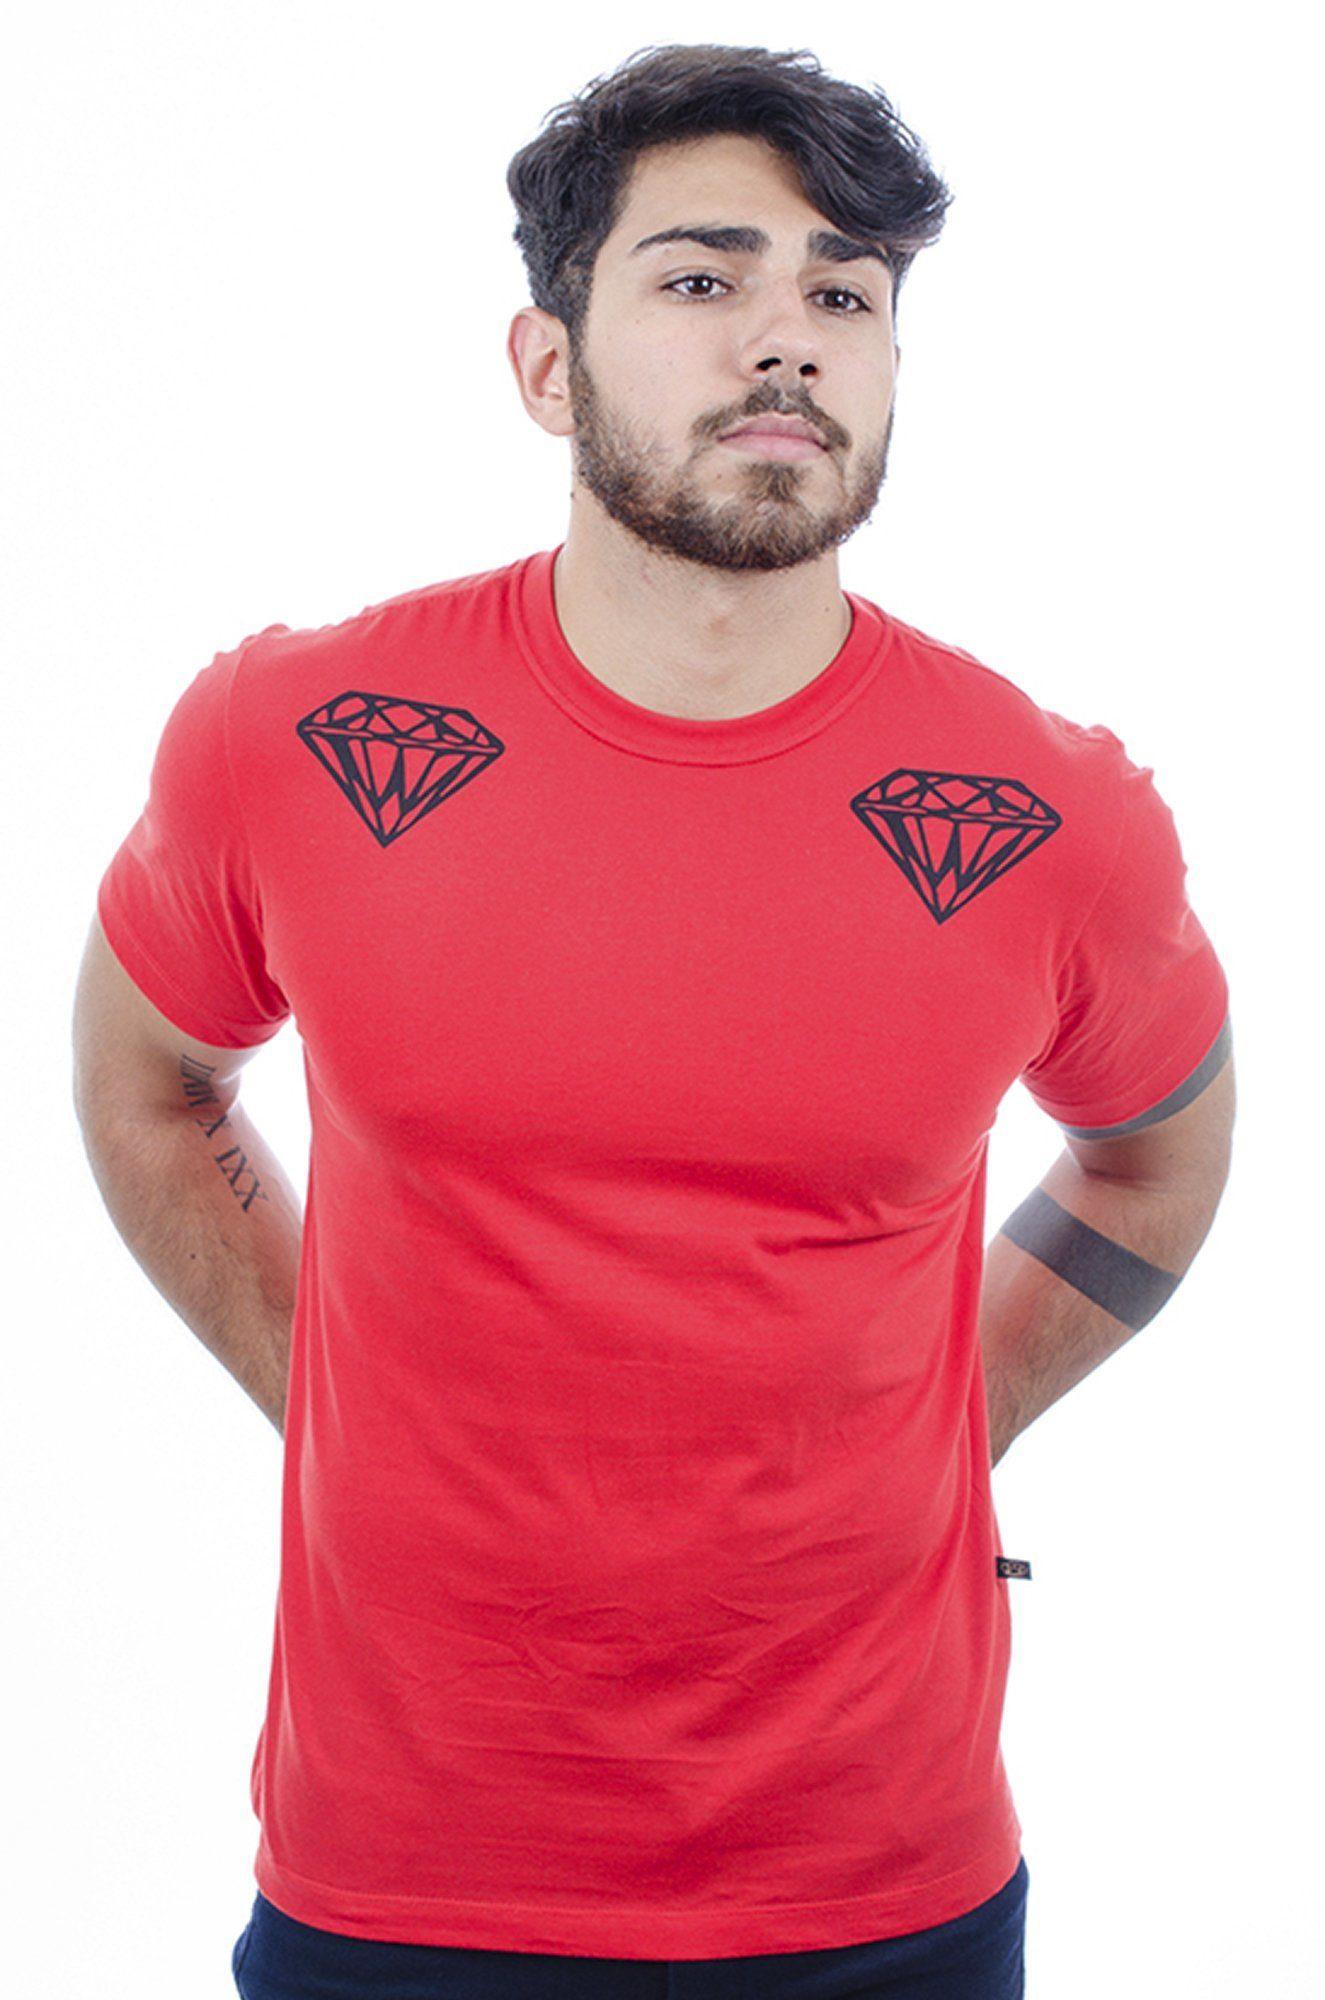 Camiseta Masculina Estampada Hardivision Diamonds Vermelho